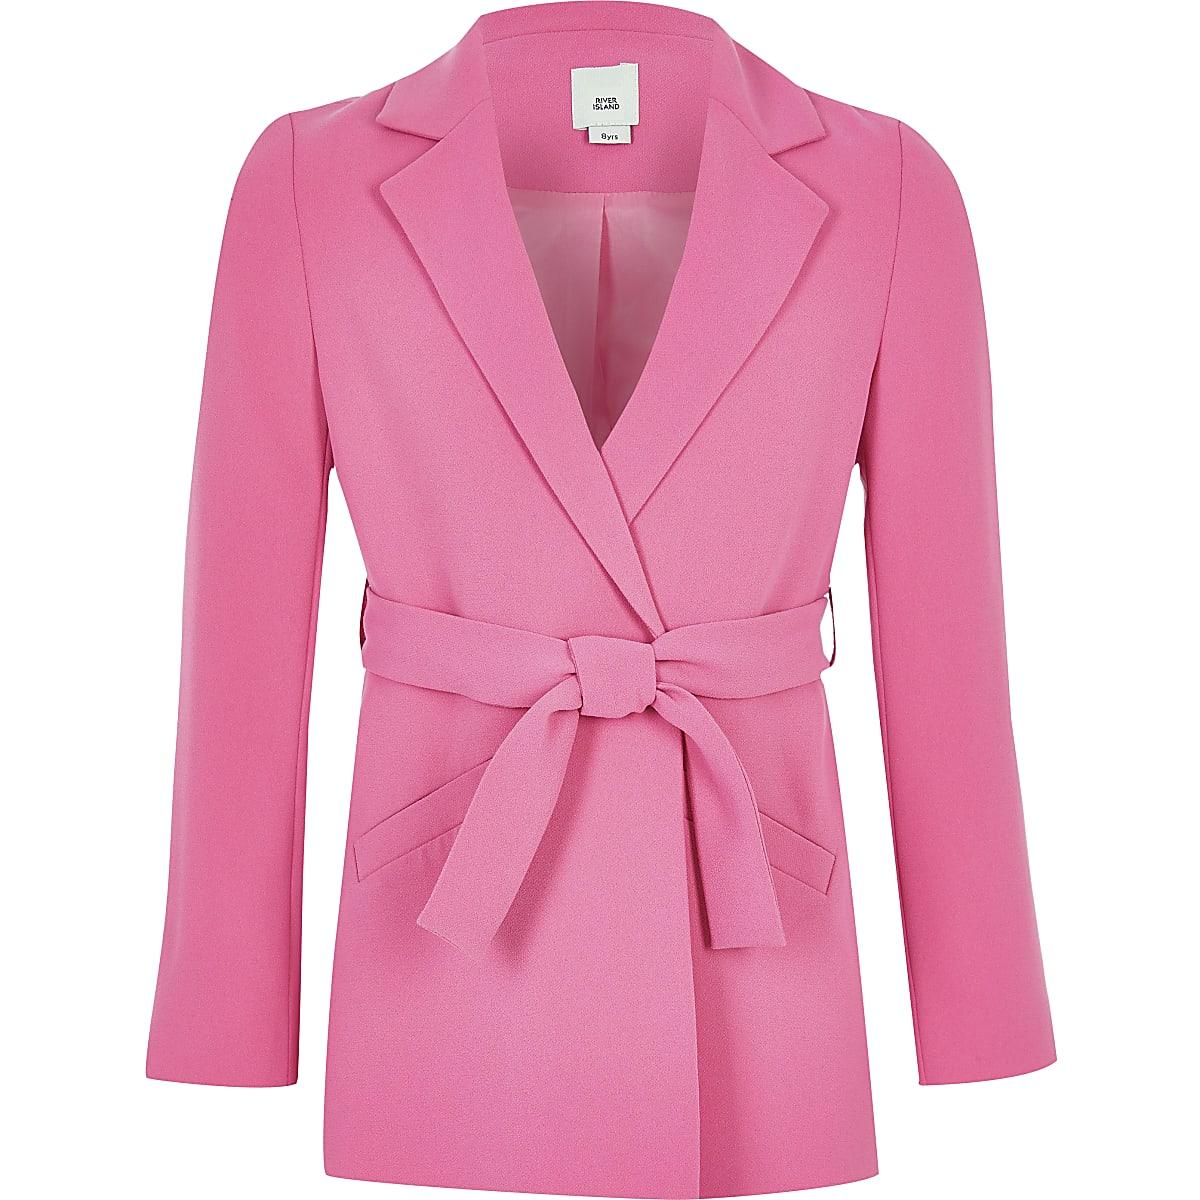 Girls pink tie belted long sleeve blazer